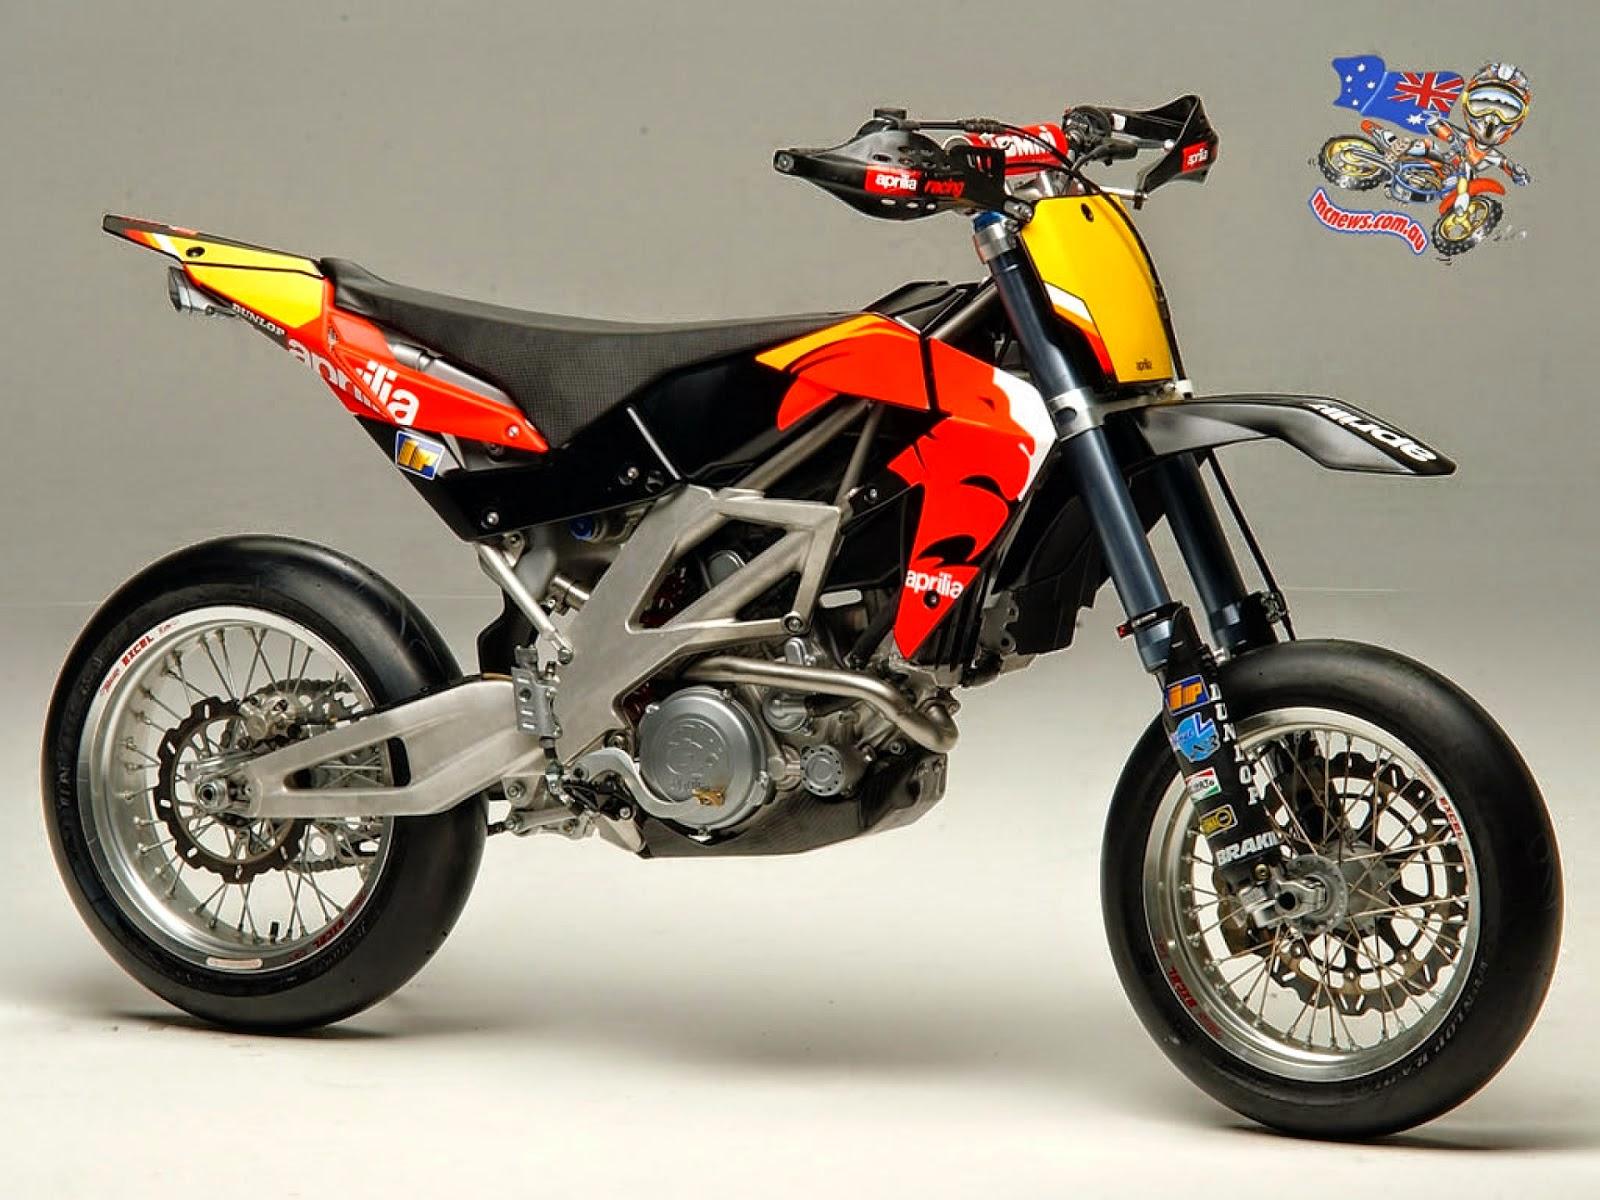 Download 82 Modifikasi Motor Klx 250 Terkeren Dinding Motor